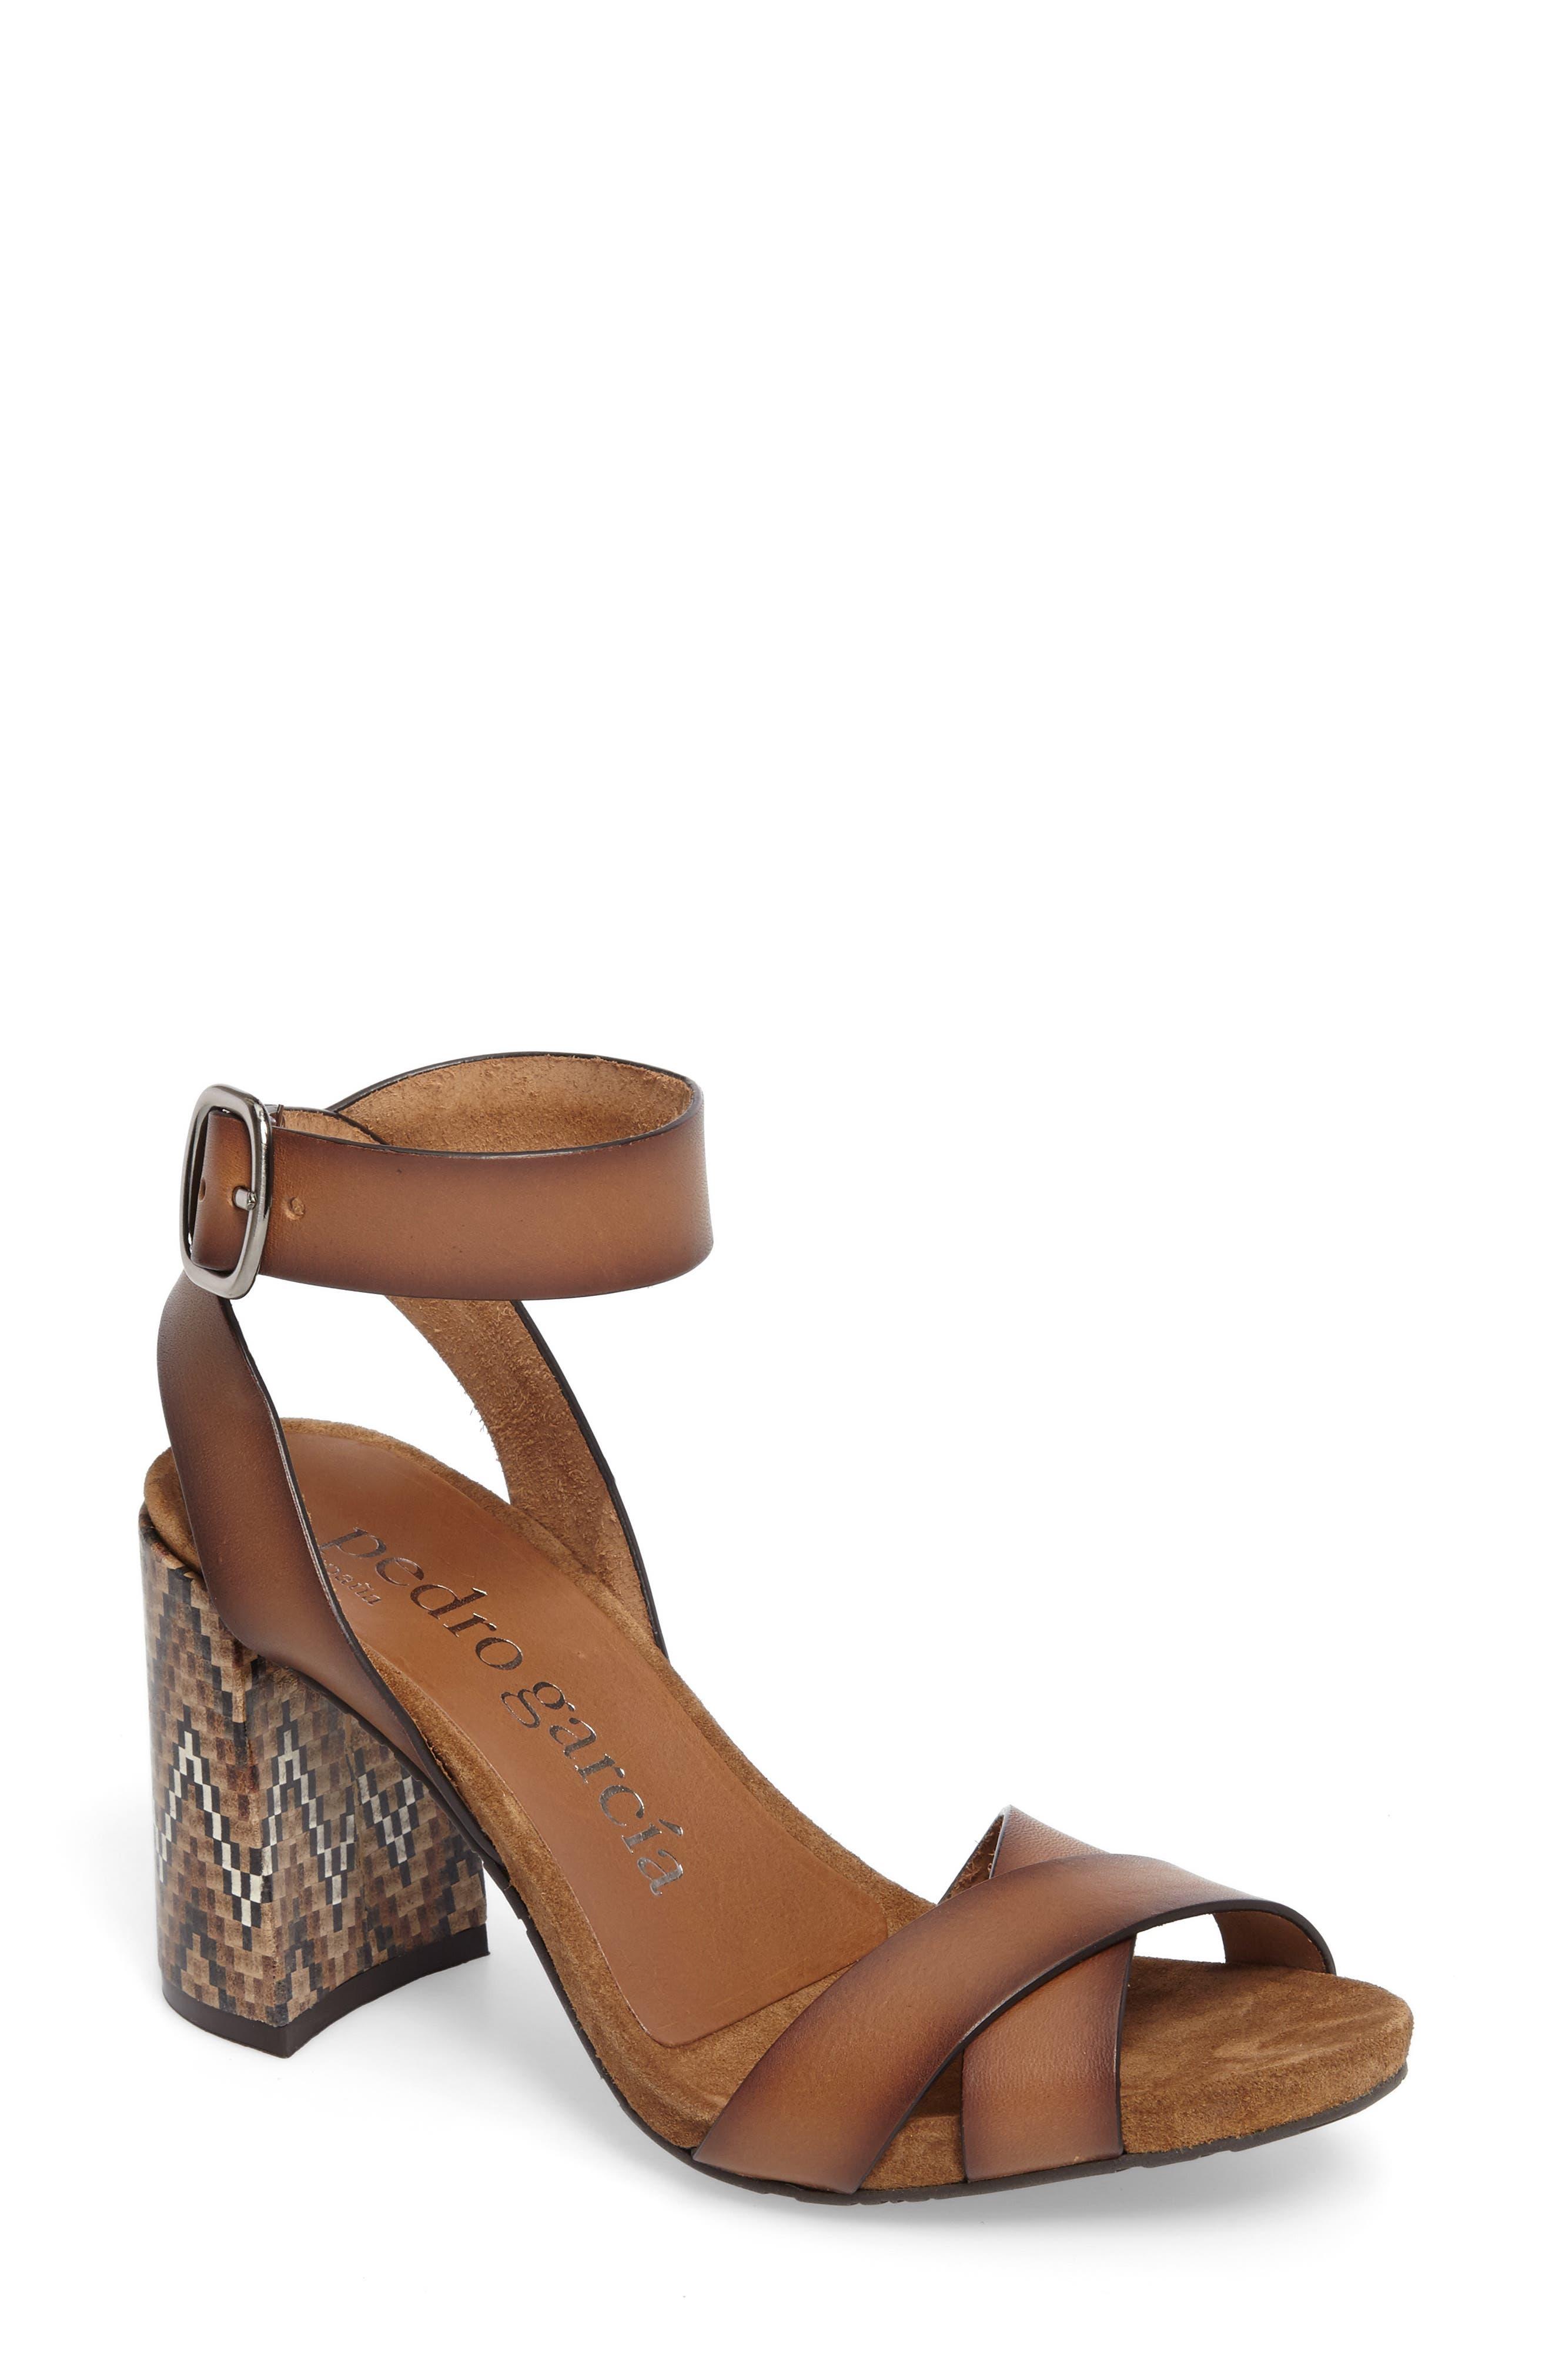 Yemba Embellished Heel Sandal,                             Main thumbnail 1, color,